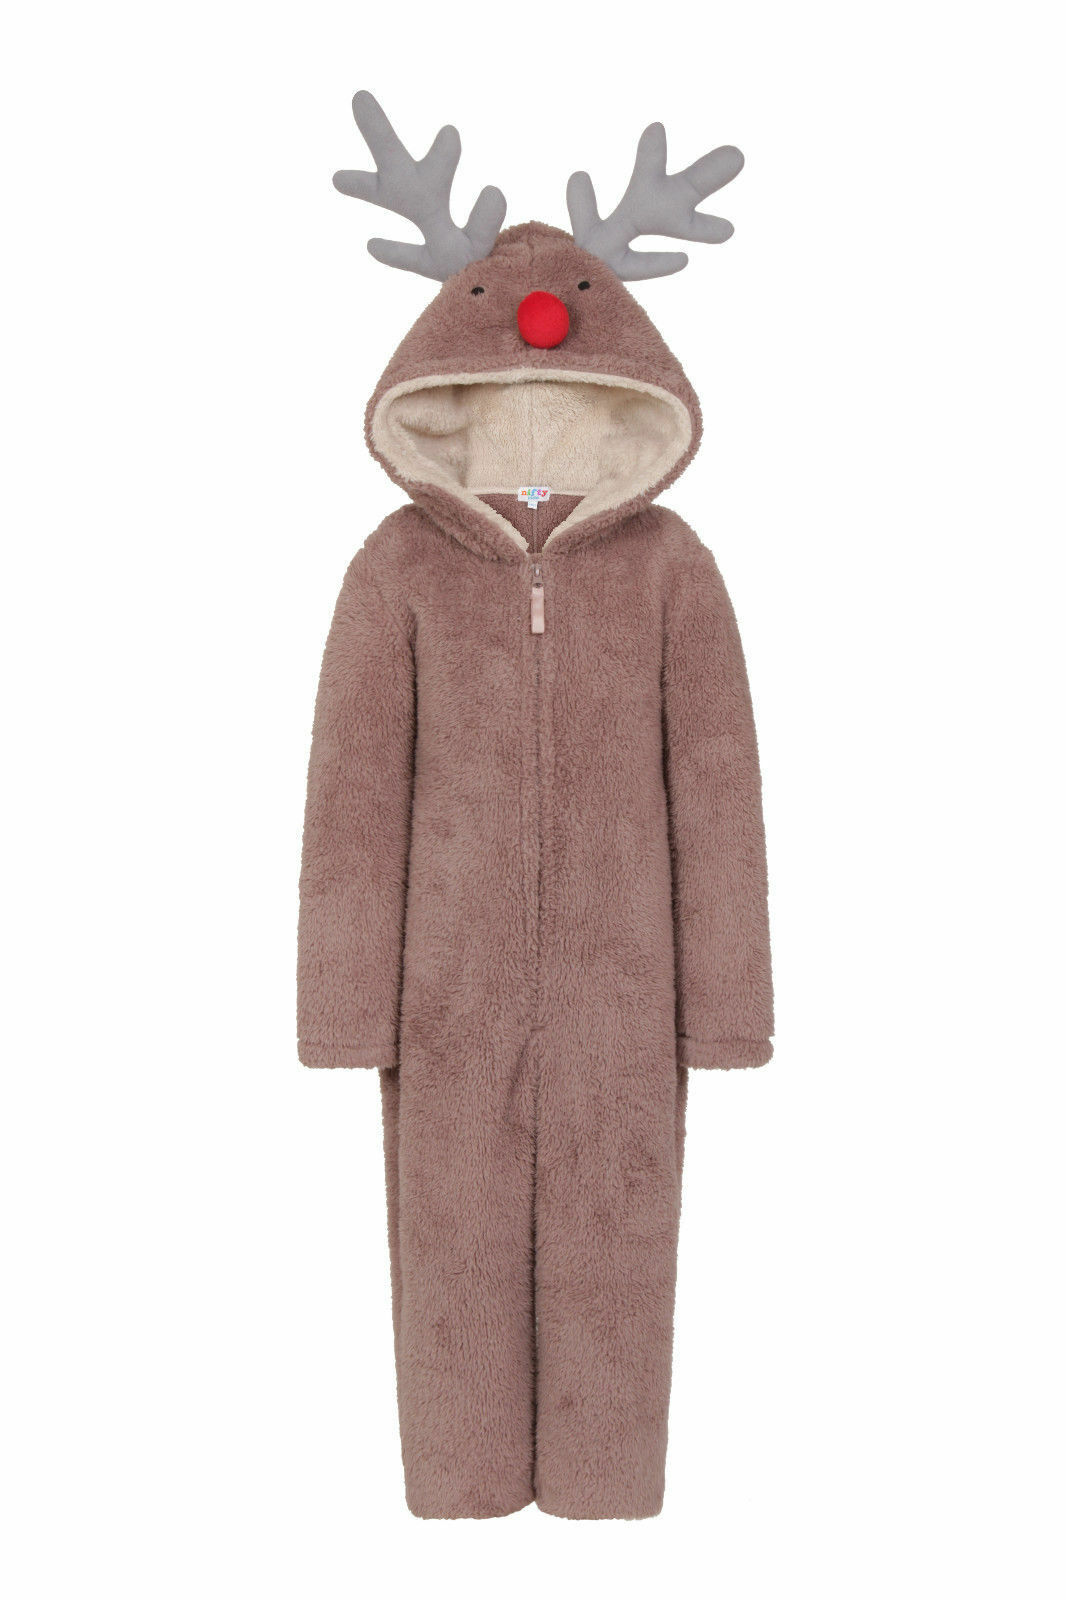 b7c68e27c698 Christmas 1Onesie Girls Boys Novelty Fleece Santa Fancy Dress ...